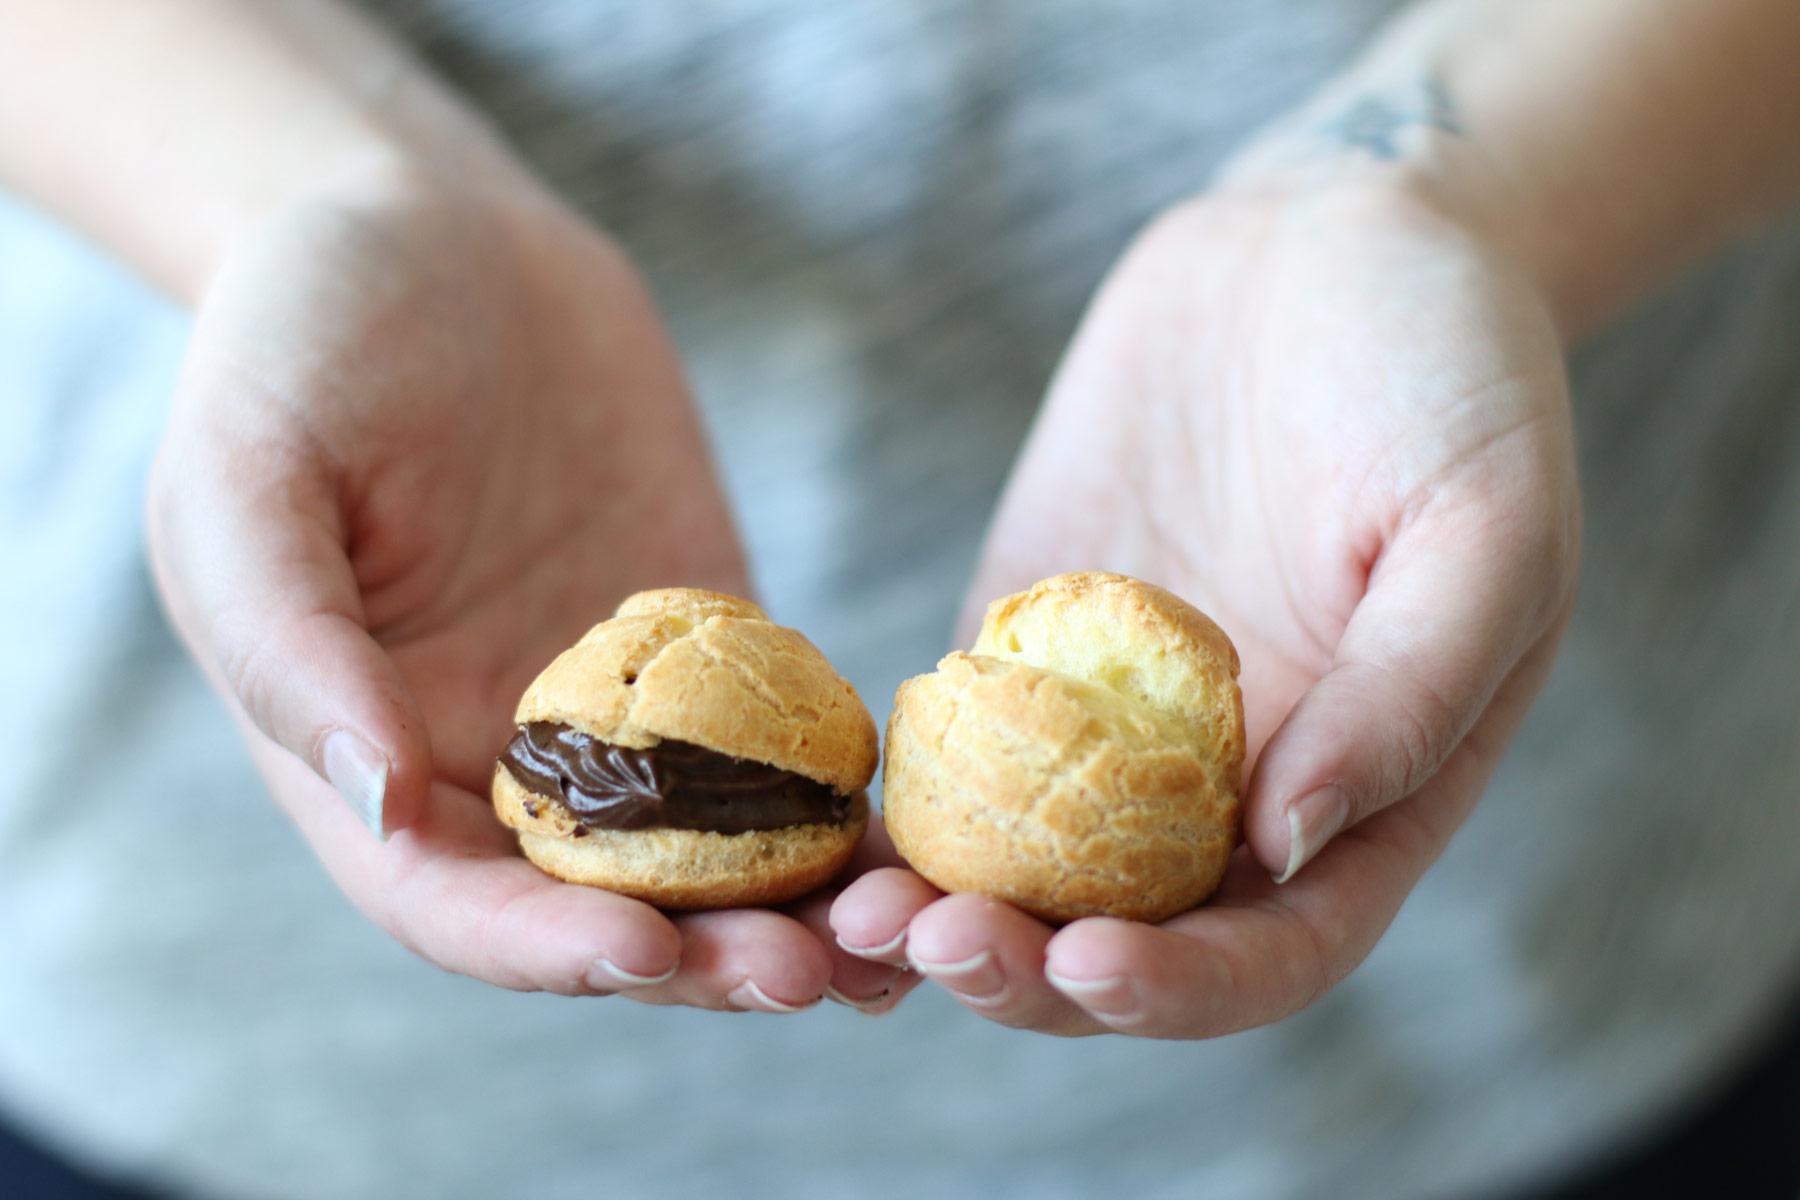 How to make a cream puff